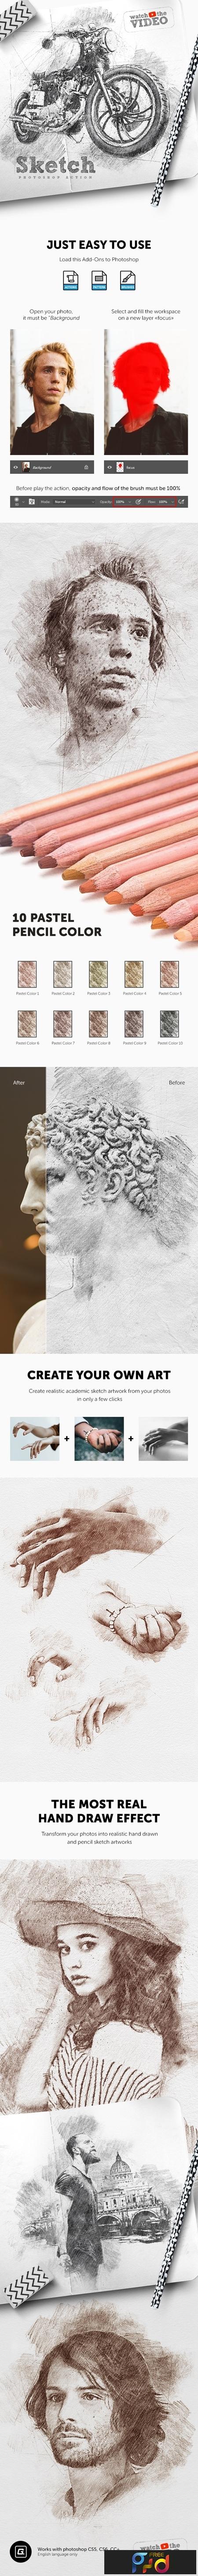 Sketch - Photoshop Action 23797082 1